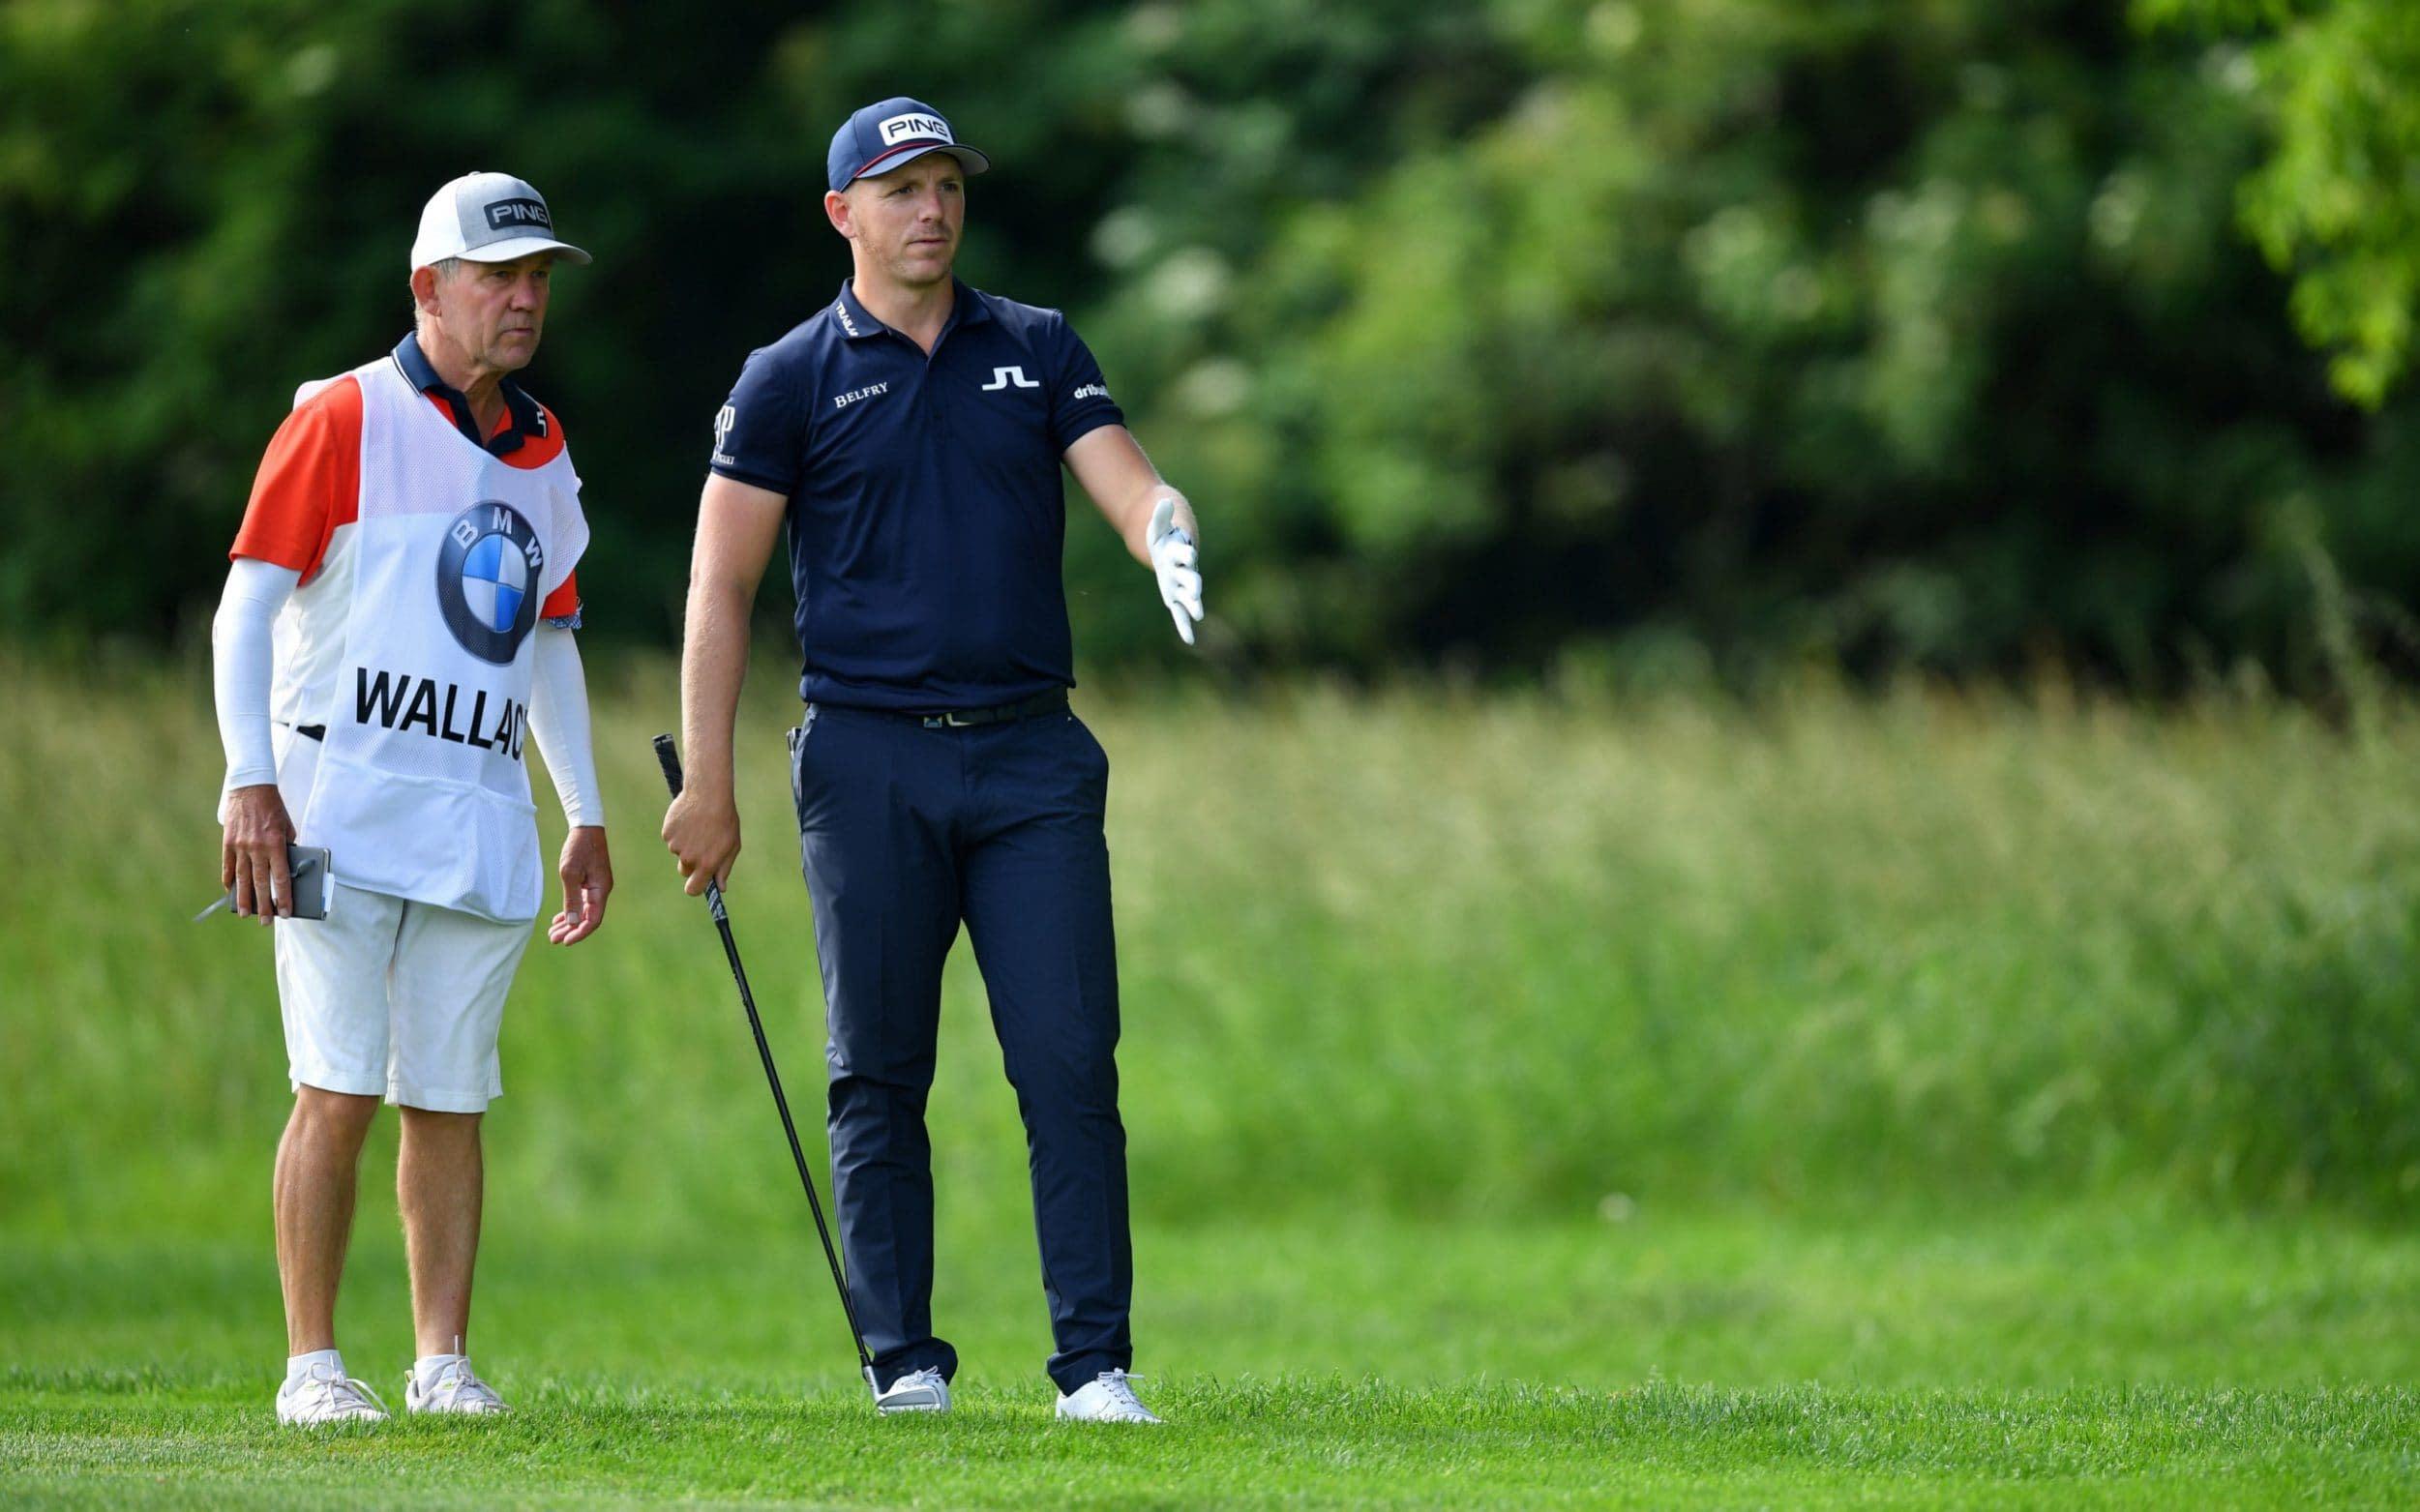 Matt Wallace camp hit back over Pete Cowen's'ridiculous' calls for European Tour ban foron-course behaviour